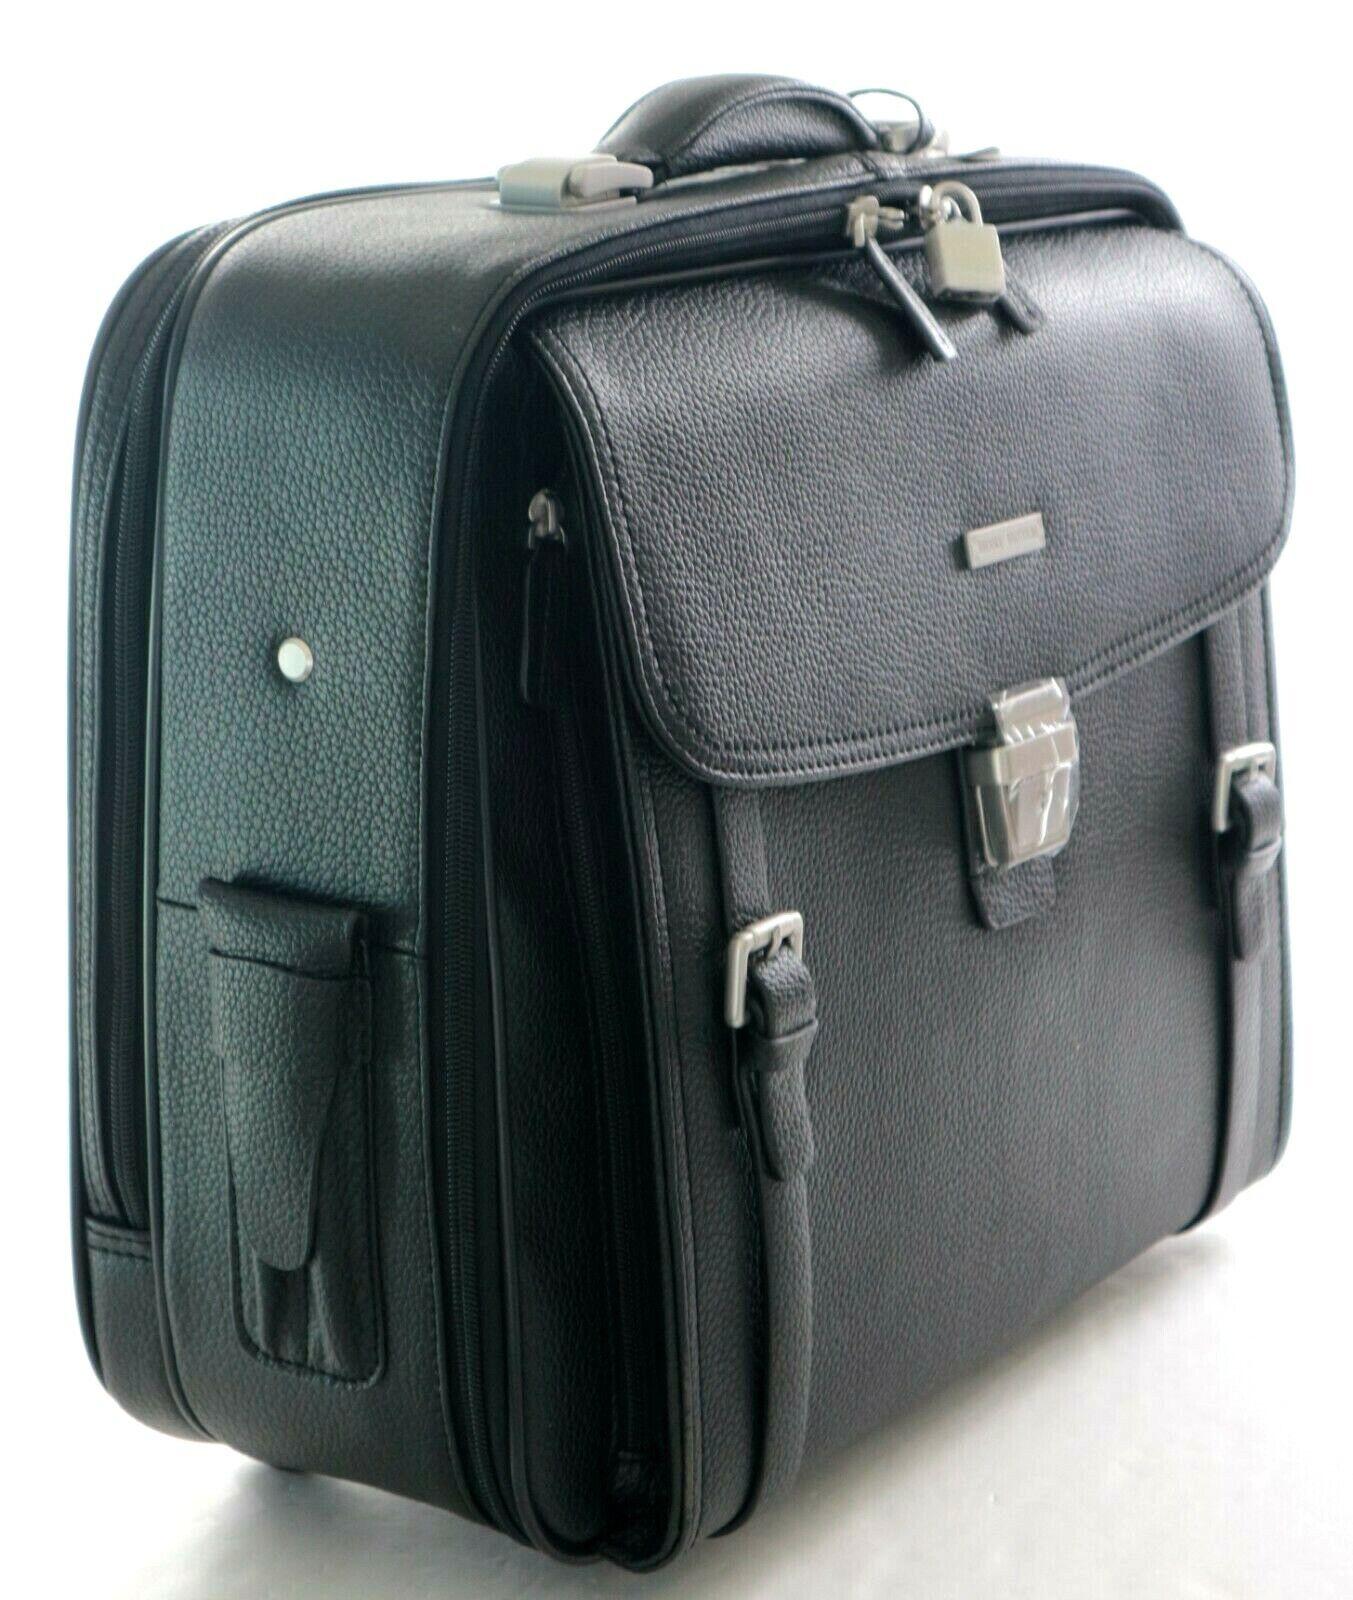 Brooks Brothers Genuine Leather Trolley Travel Bag Black NEW!